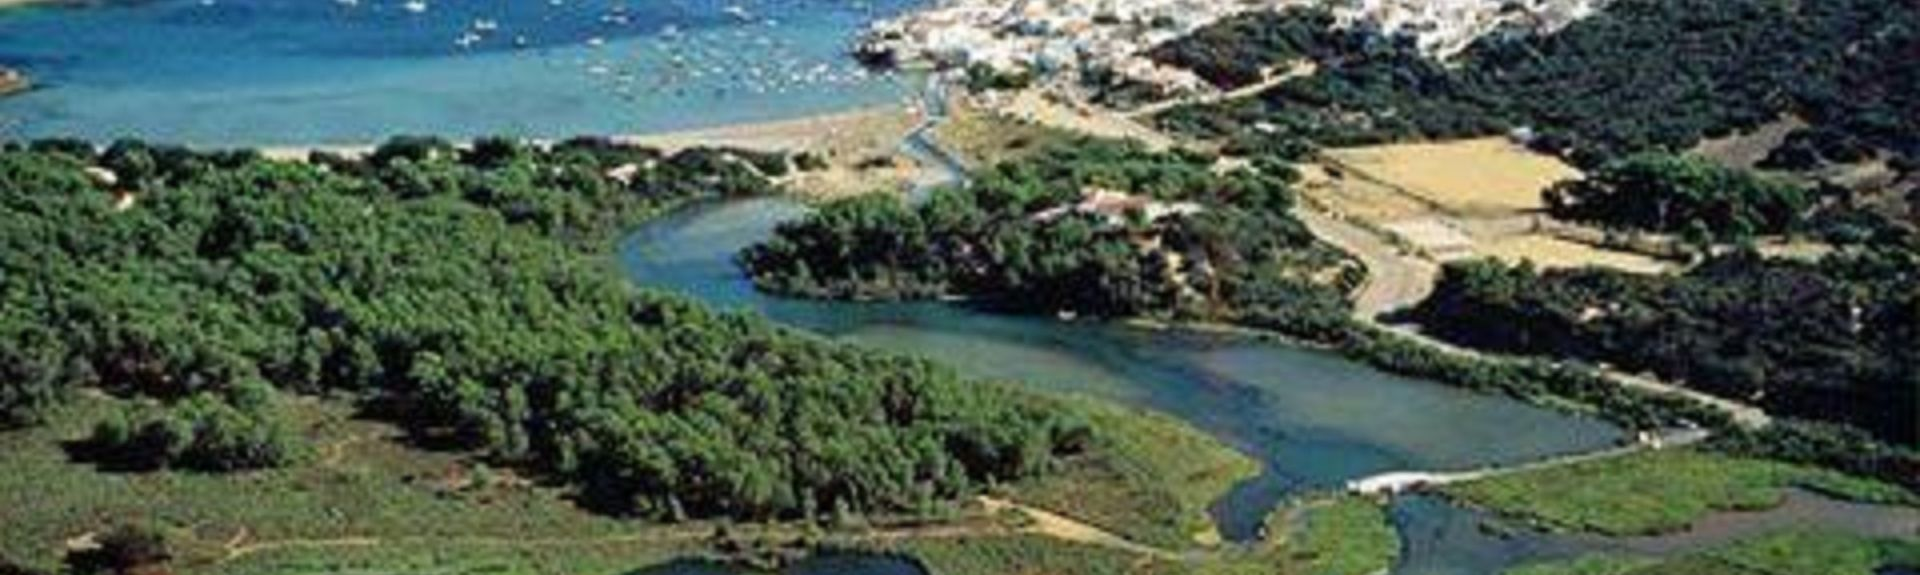 Binixica, Ilhas Baleares, Espanha